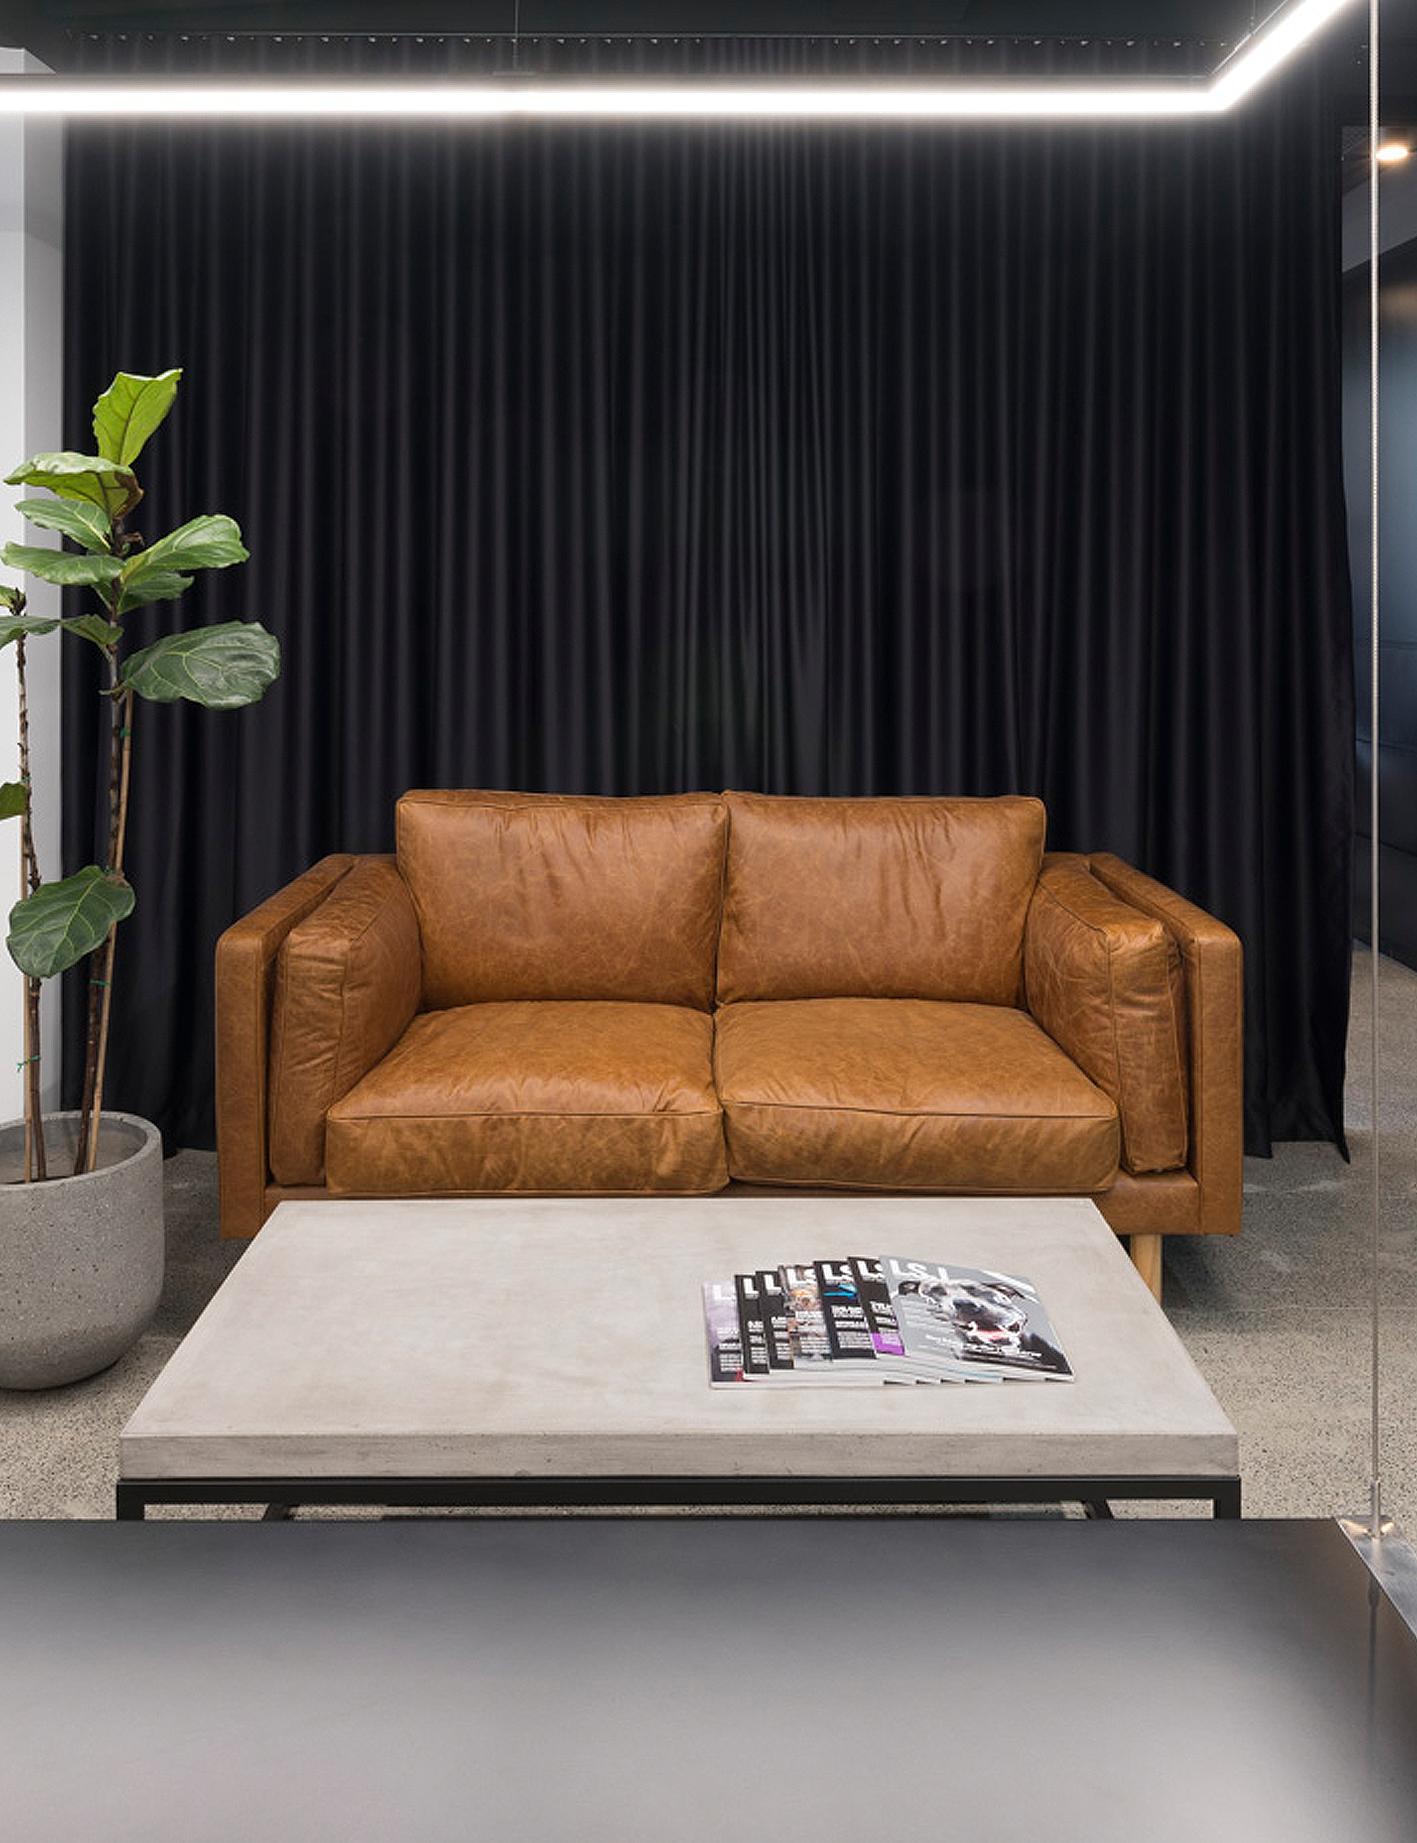 Rusty 2 seater – Custom designed / created lounge